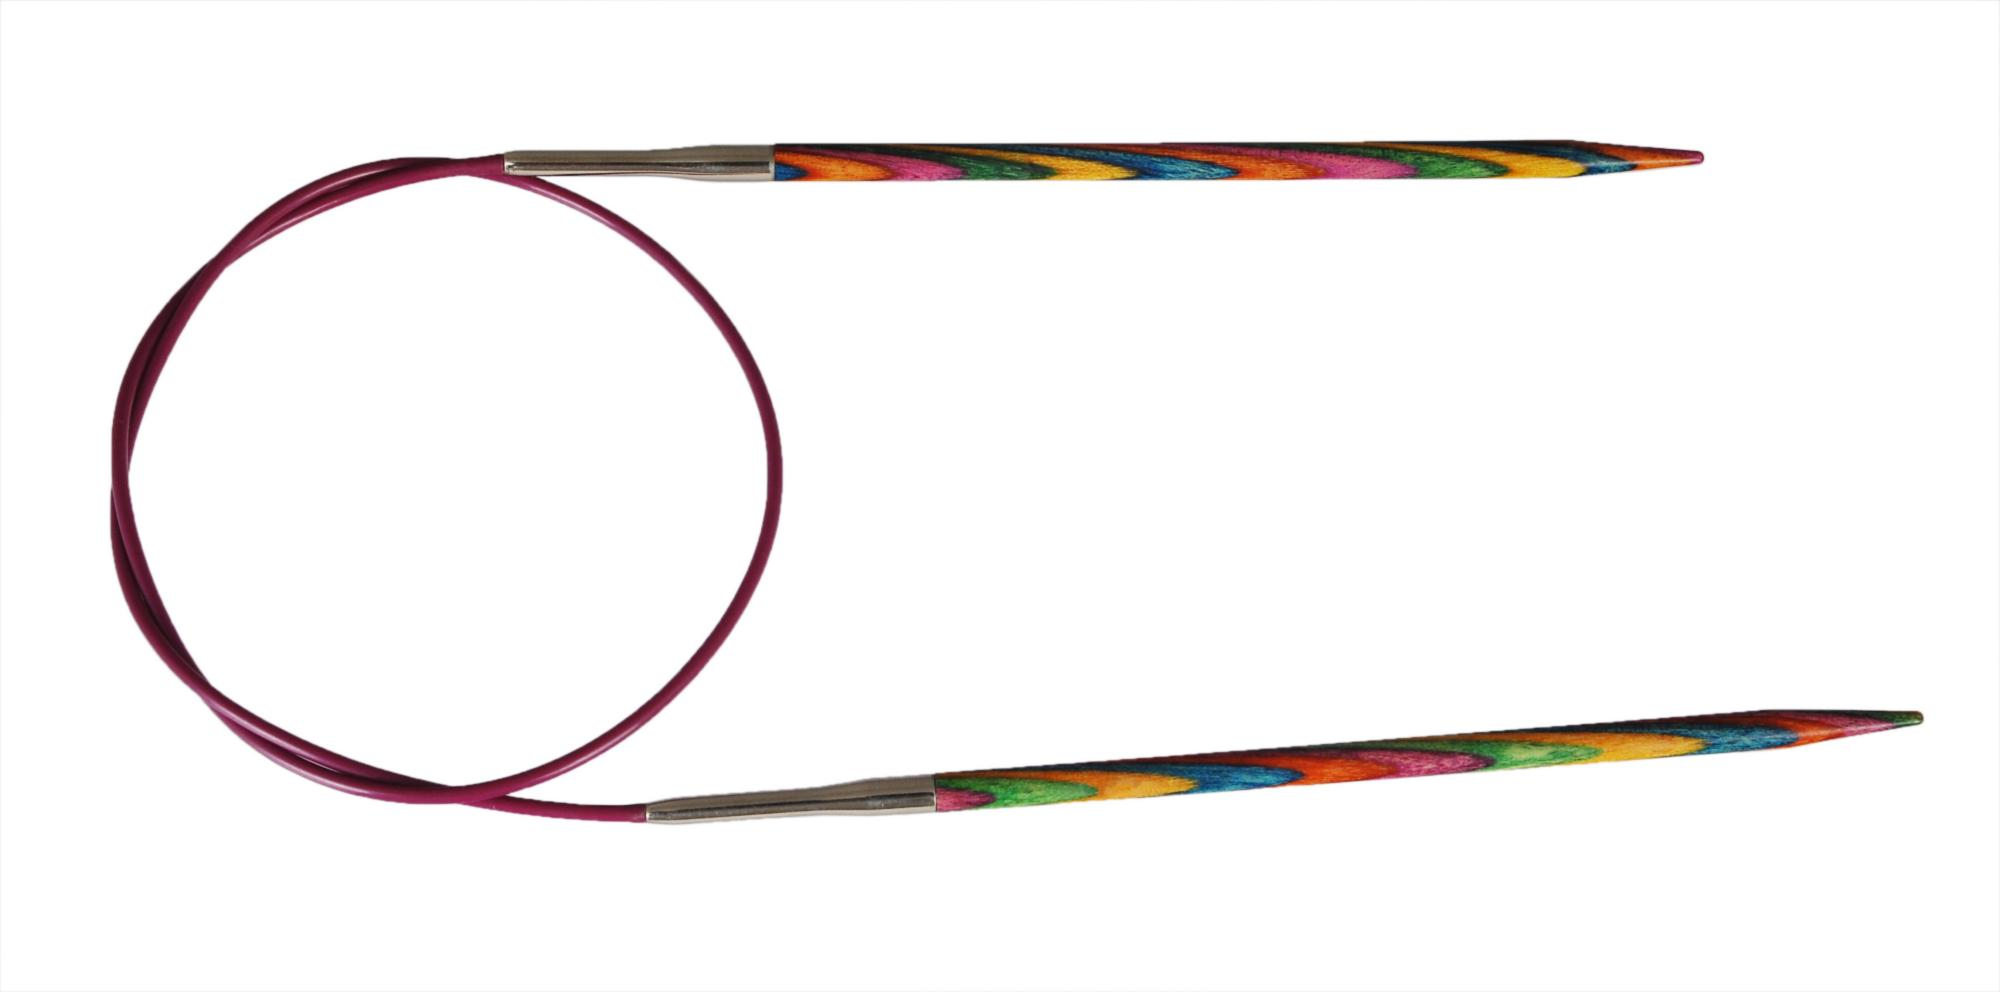 Спицы круговые 50 см Symfonie Wood KnitPro, 20389, 4.00 мм